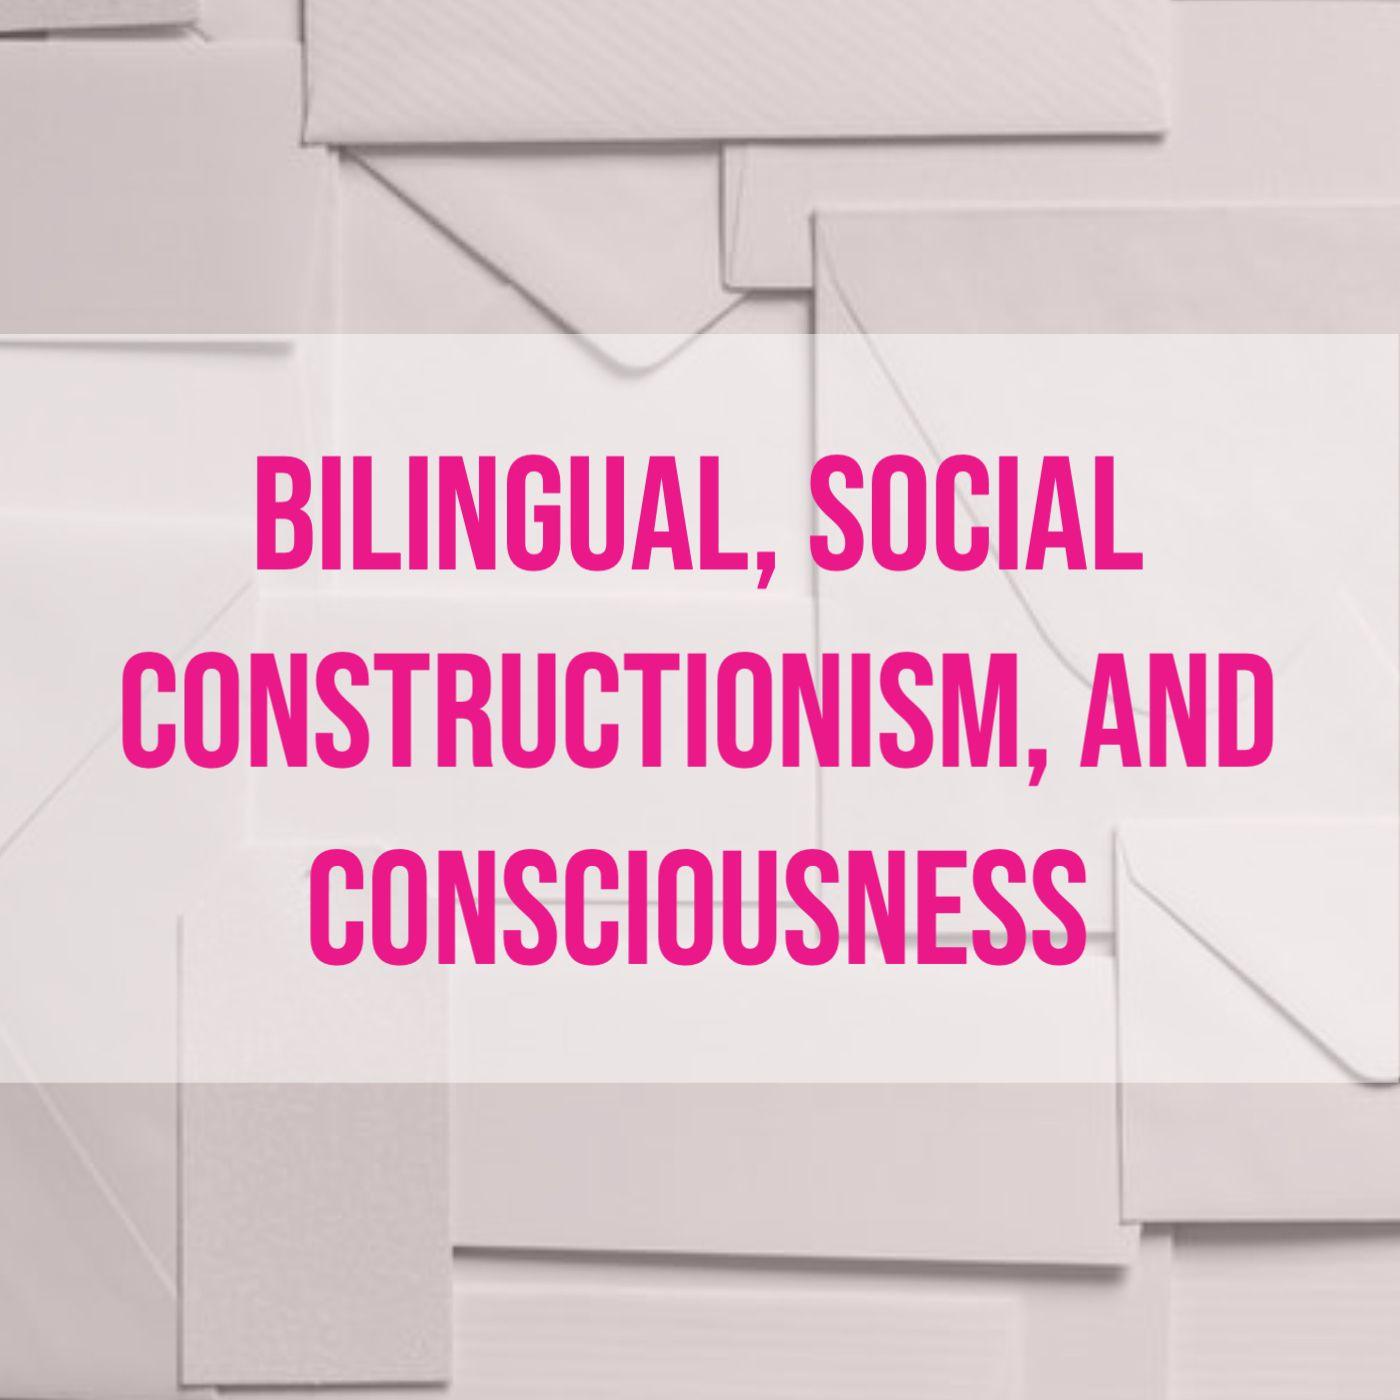 Bilingual, Social Constructionism, and Consciousness